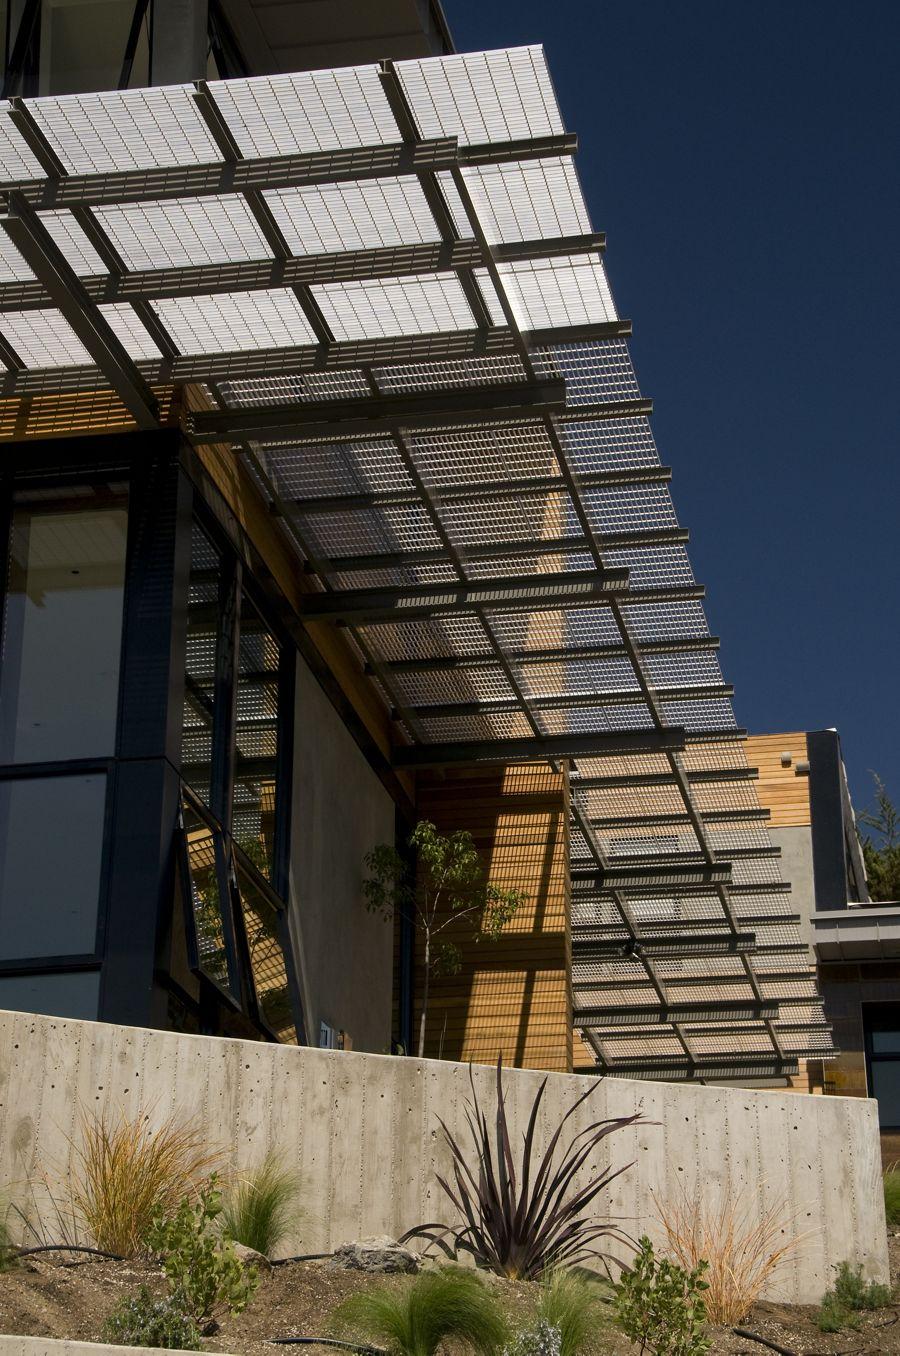 mcnichols-bargrating-sunshadepanels-deckingflooring